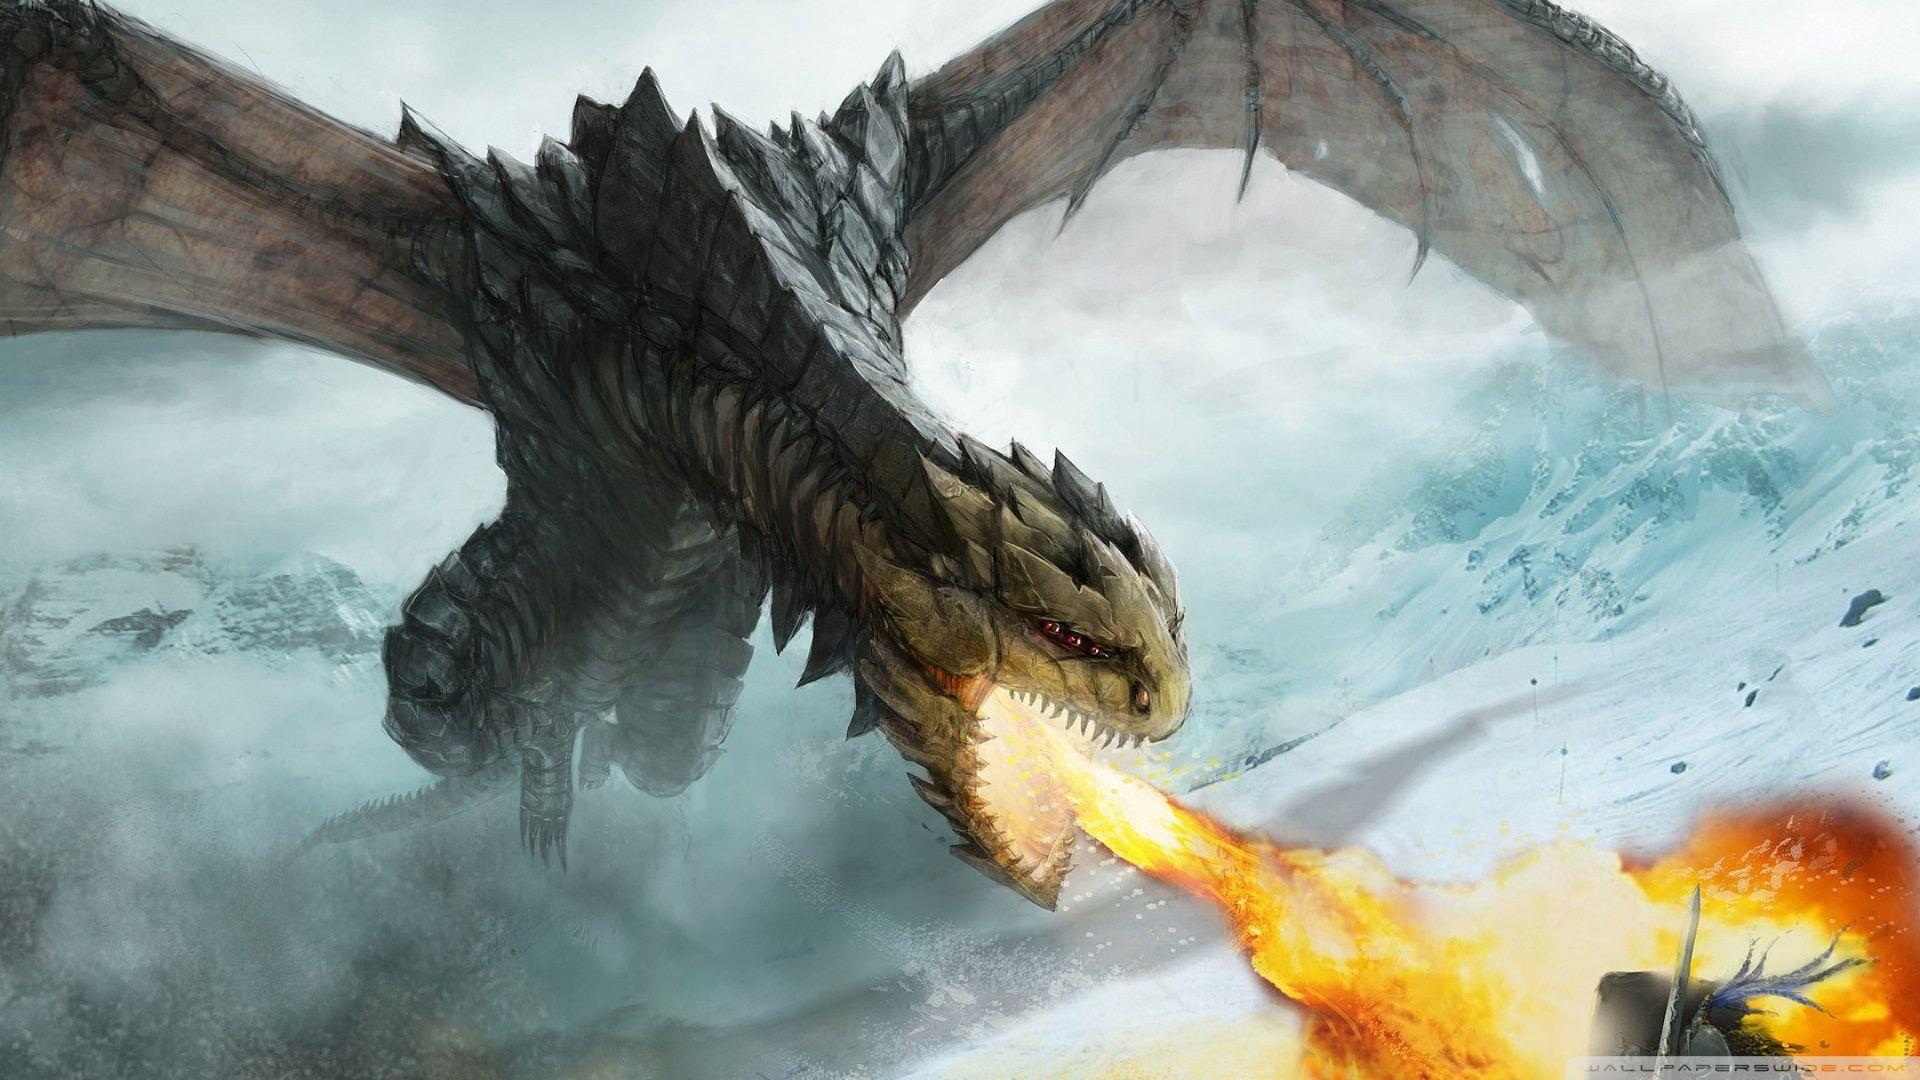 Epic Dragon Wallpapers HD - Wallpaper Cave